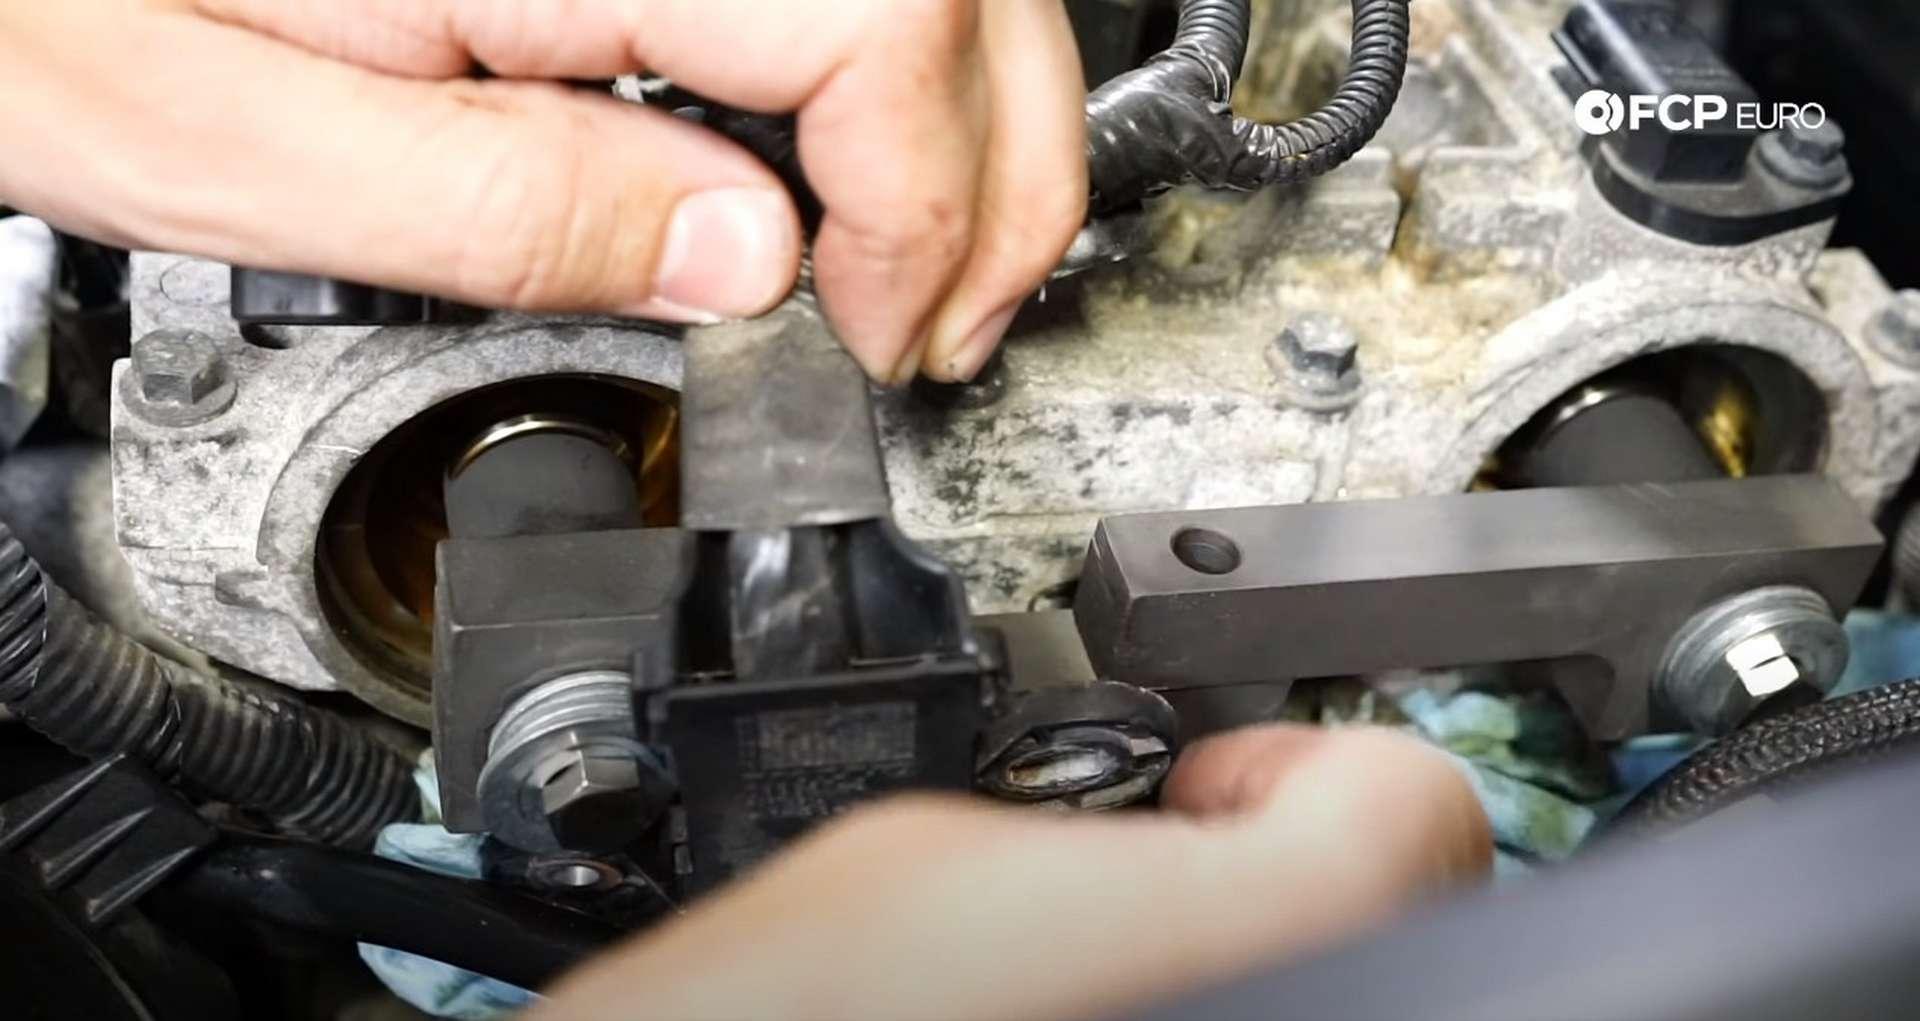 DIY Volvo P1 Water Pump Replacement installing the cam locking tool